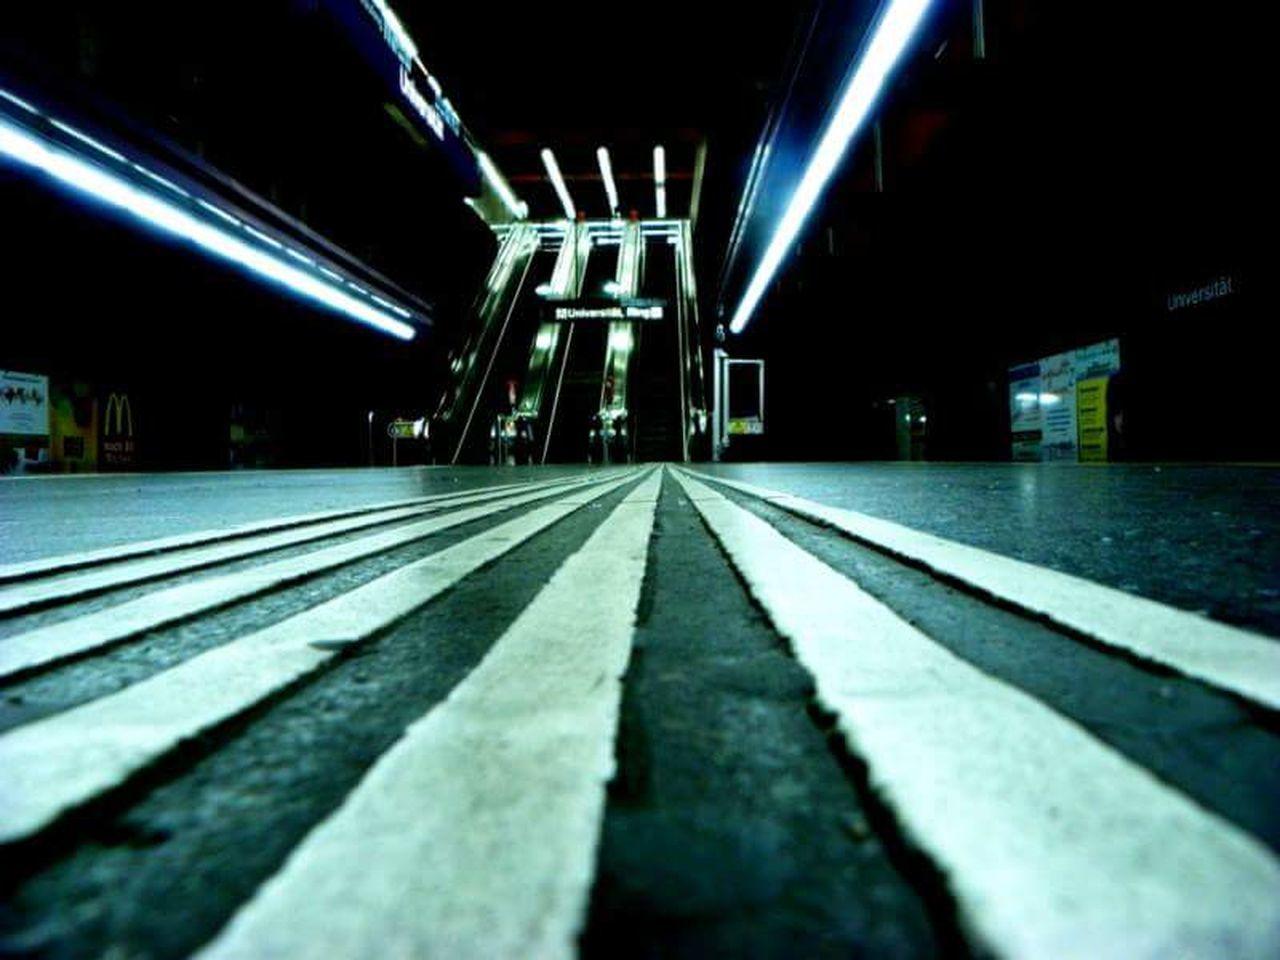 transportation, surface level, empty, illuminated, no people, railroad track, night, indoors, the way forward